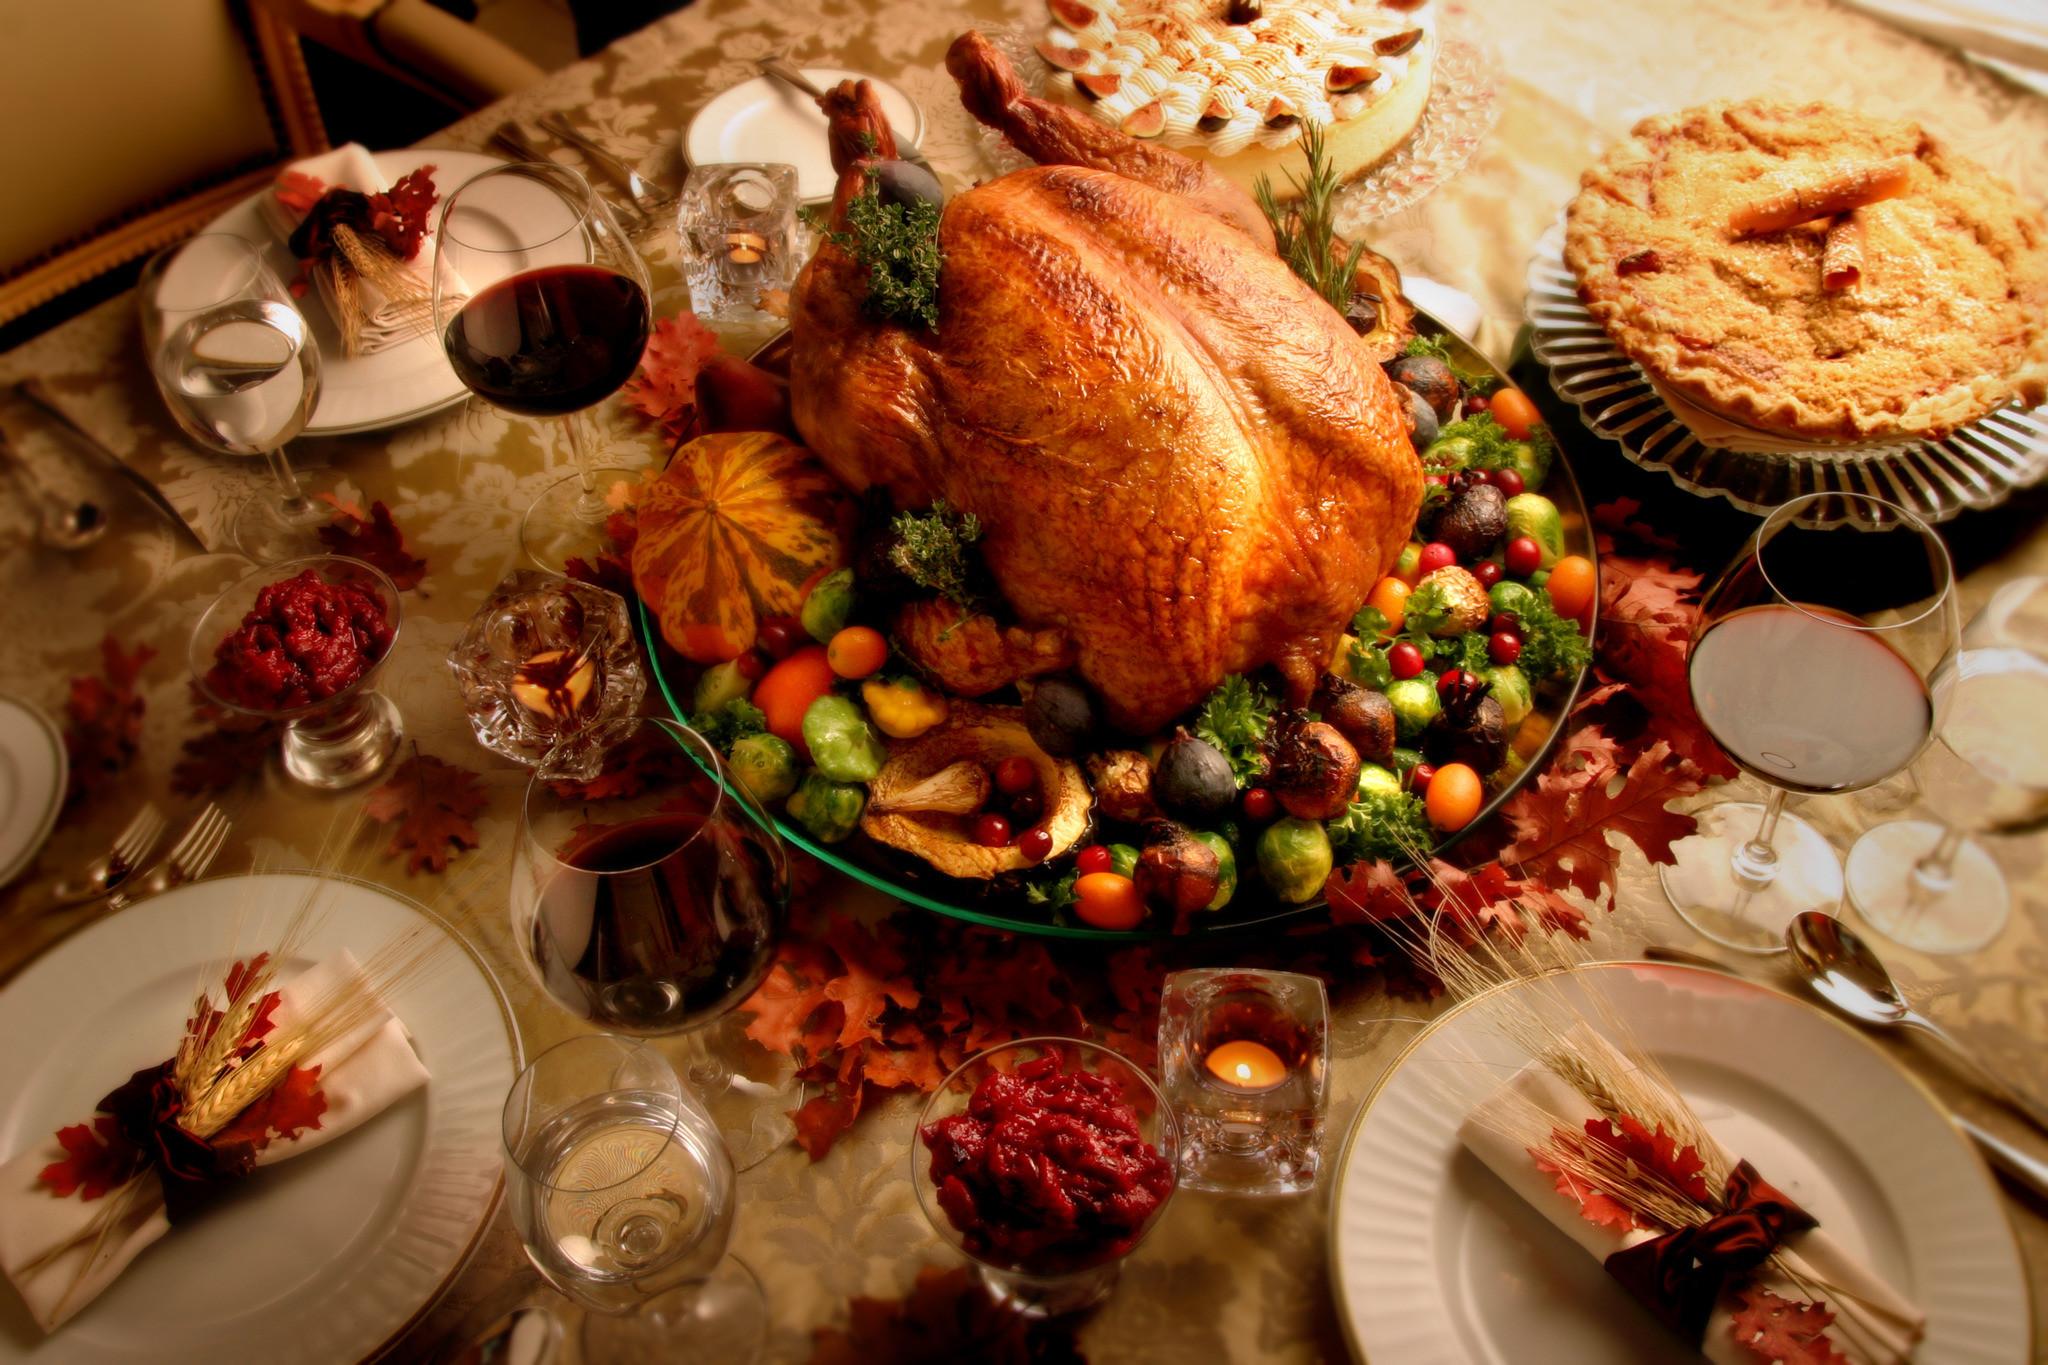 Thanksgiving Dinner To Go 2019  November 2019 Events Calendar for Los Angeles